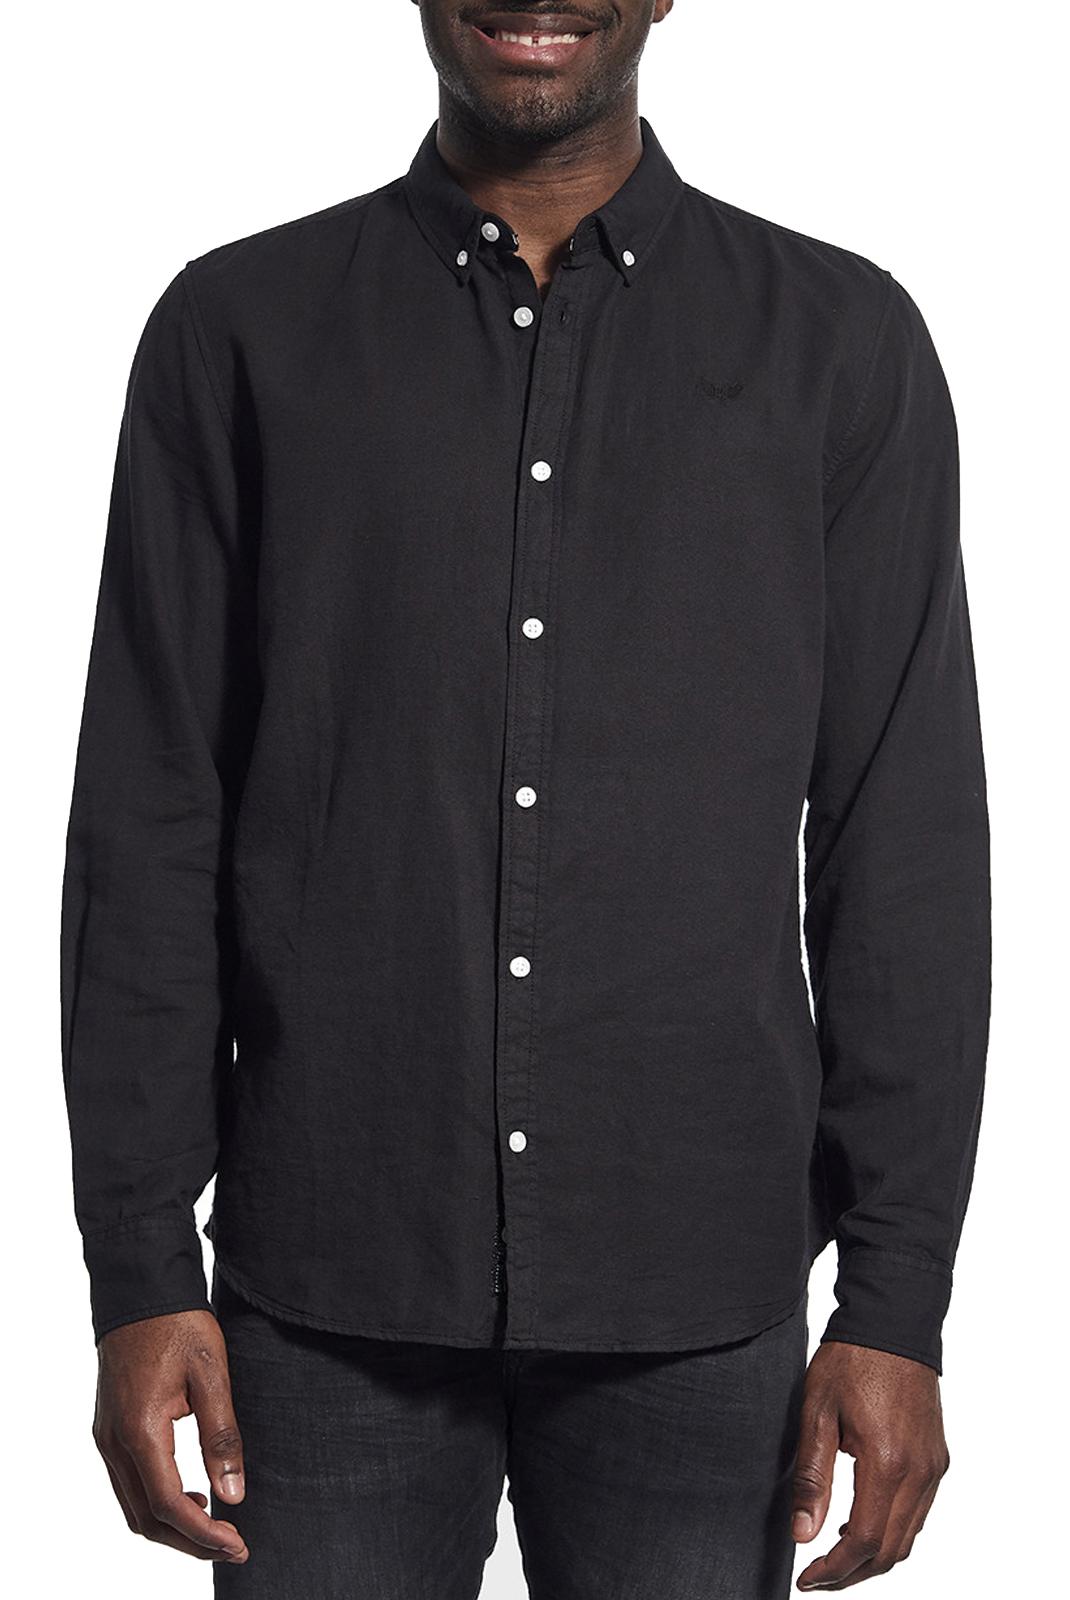 Chemises manches longues  Kaporal WOLF BLACK